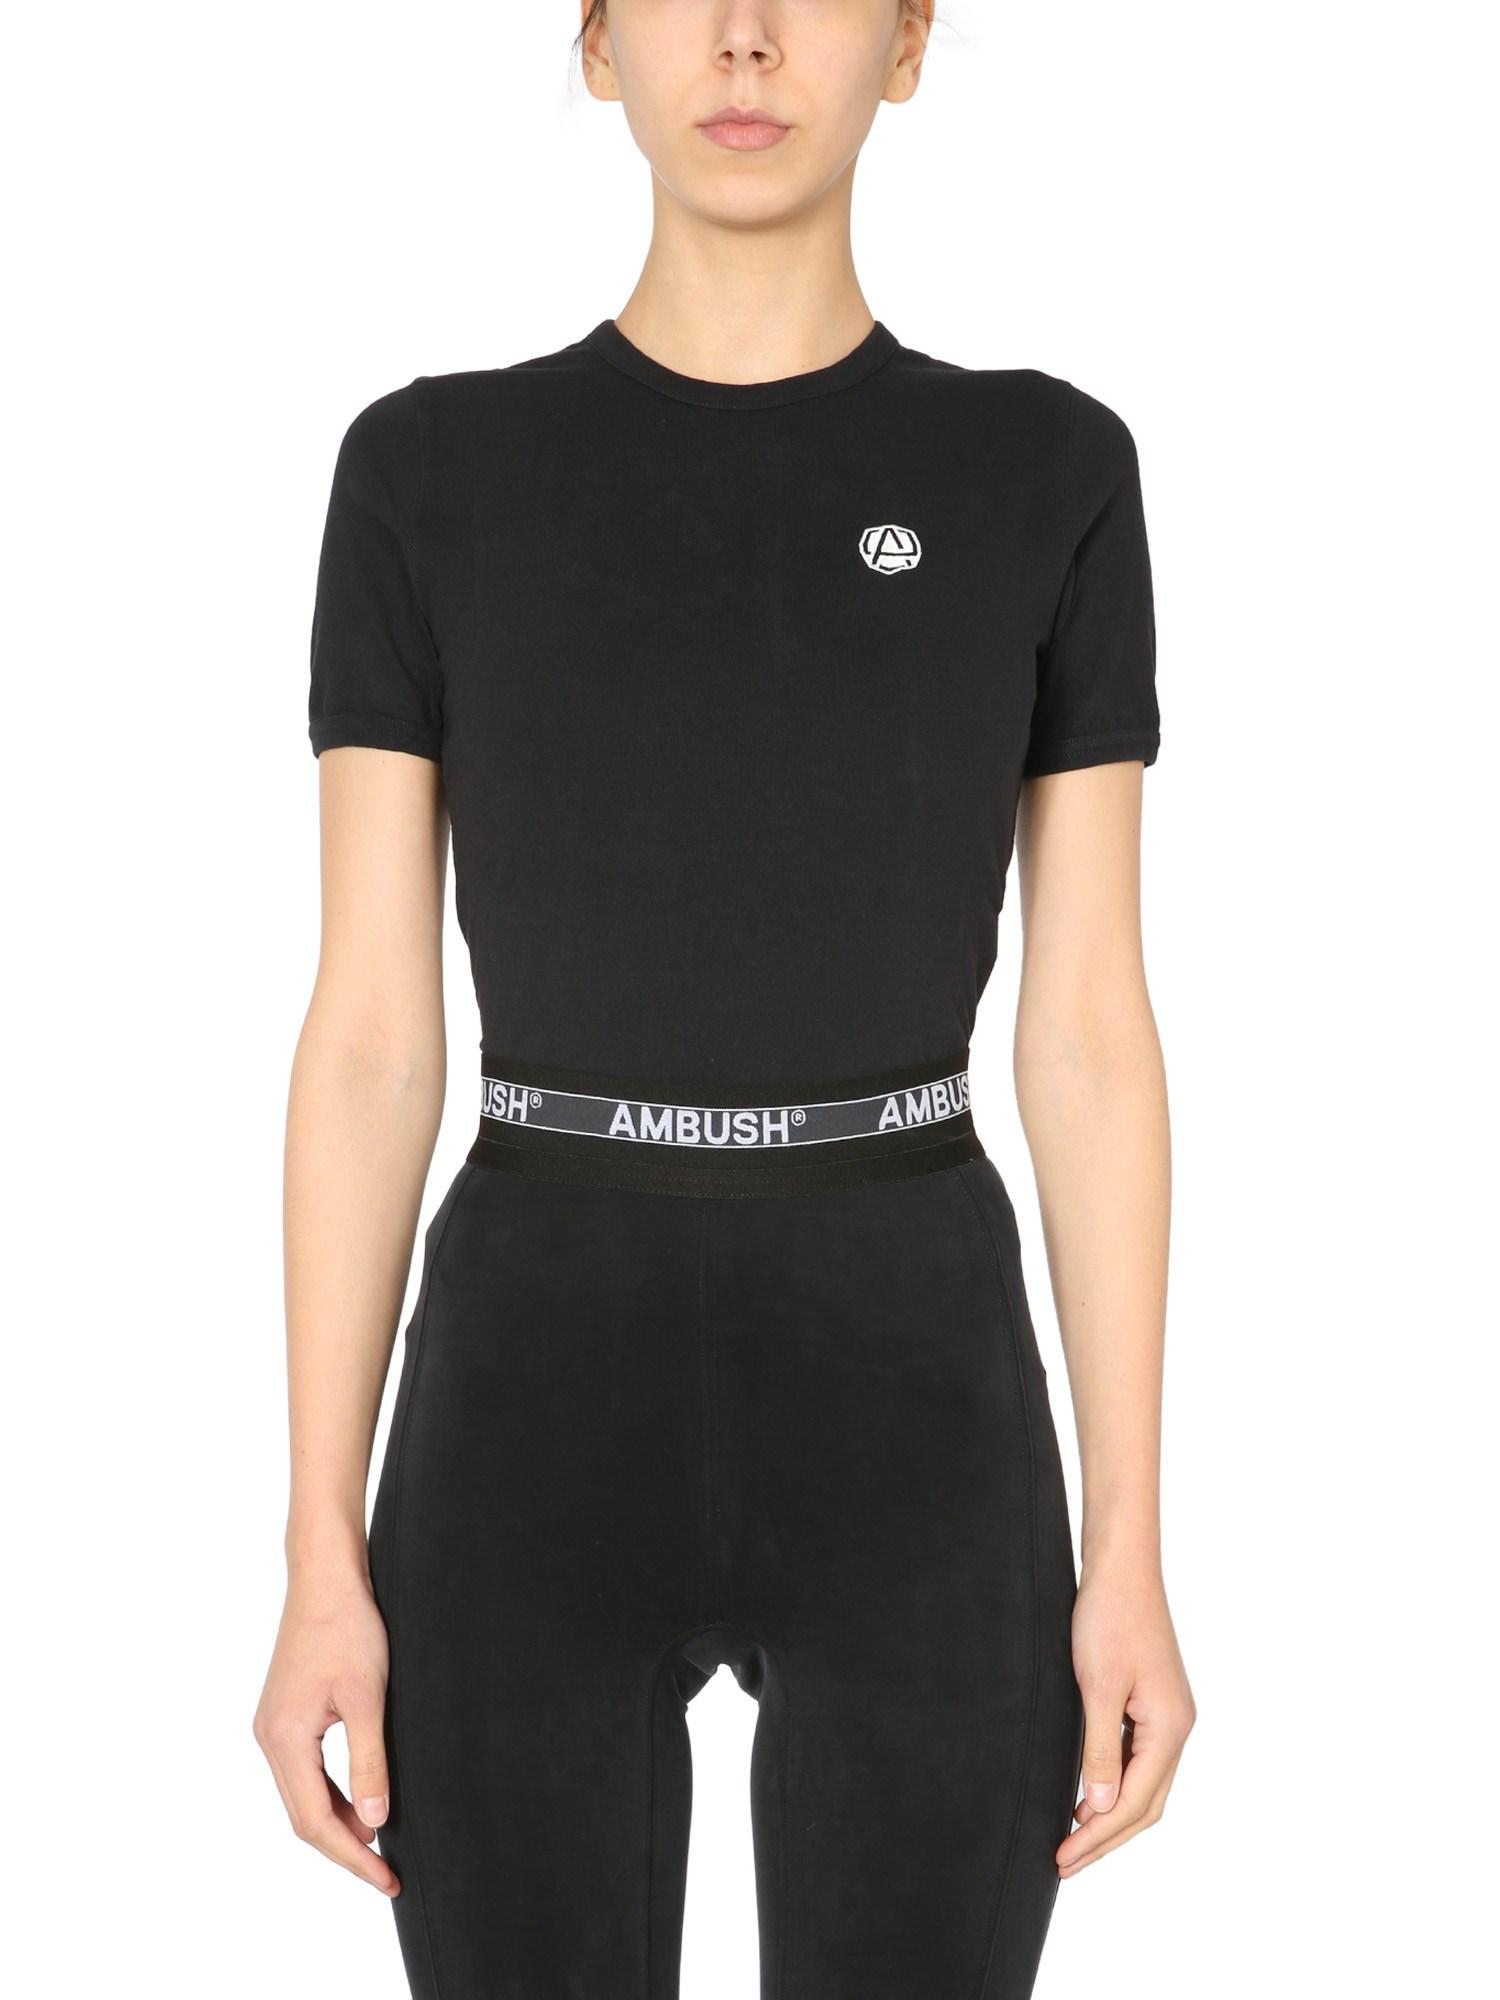 Ambush T-shirts SLIM FIT T-SHIRT